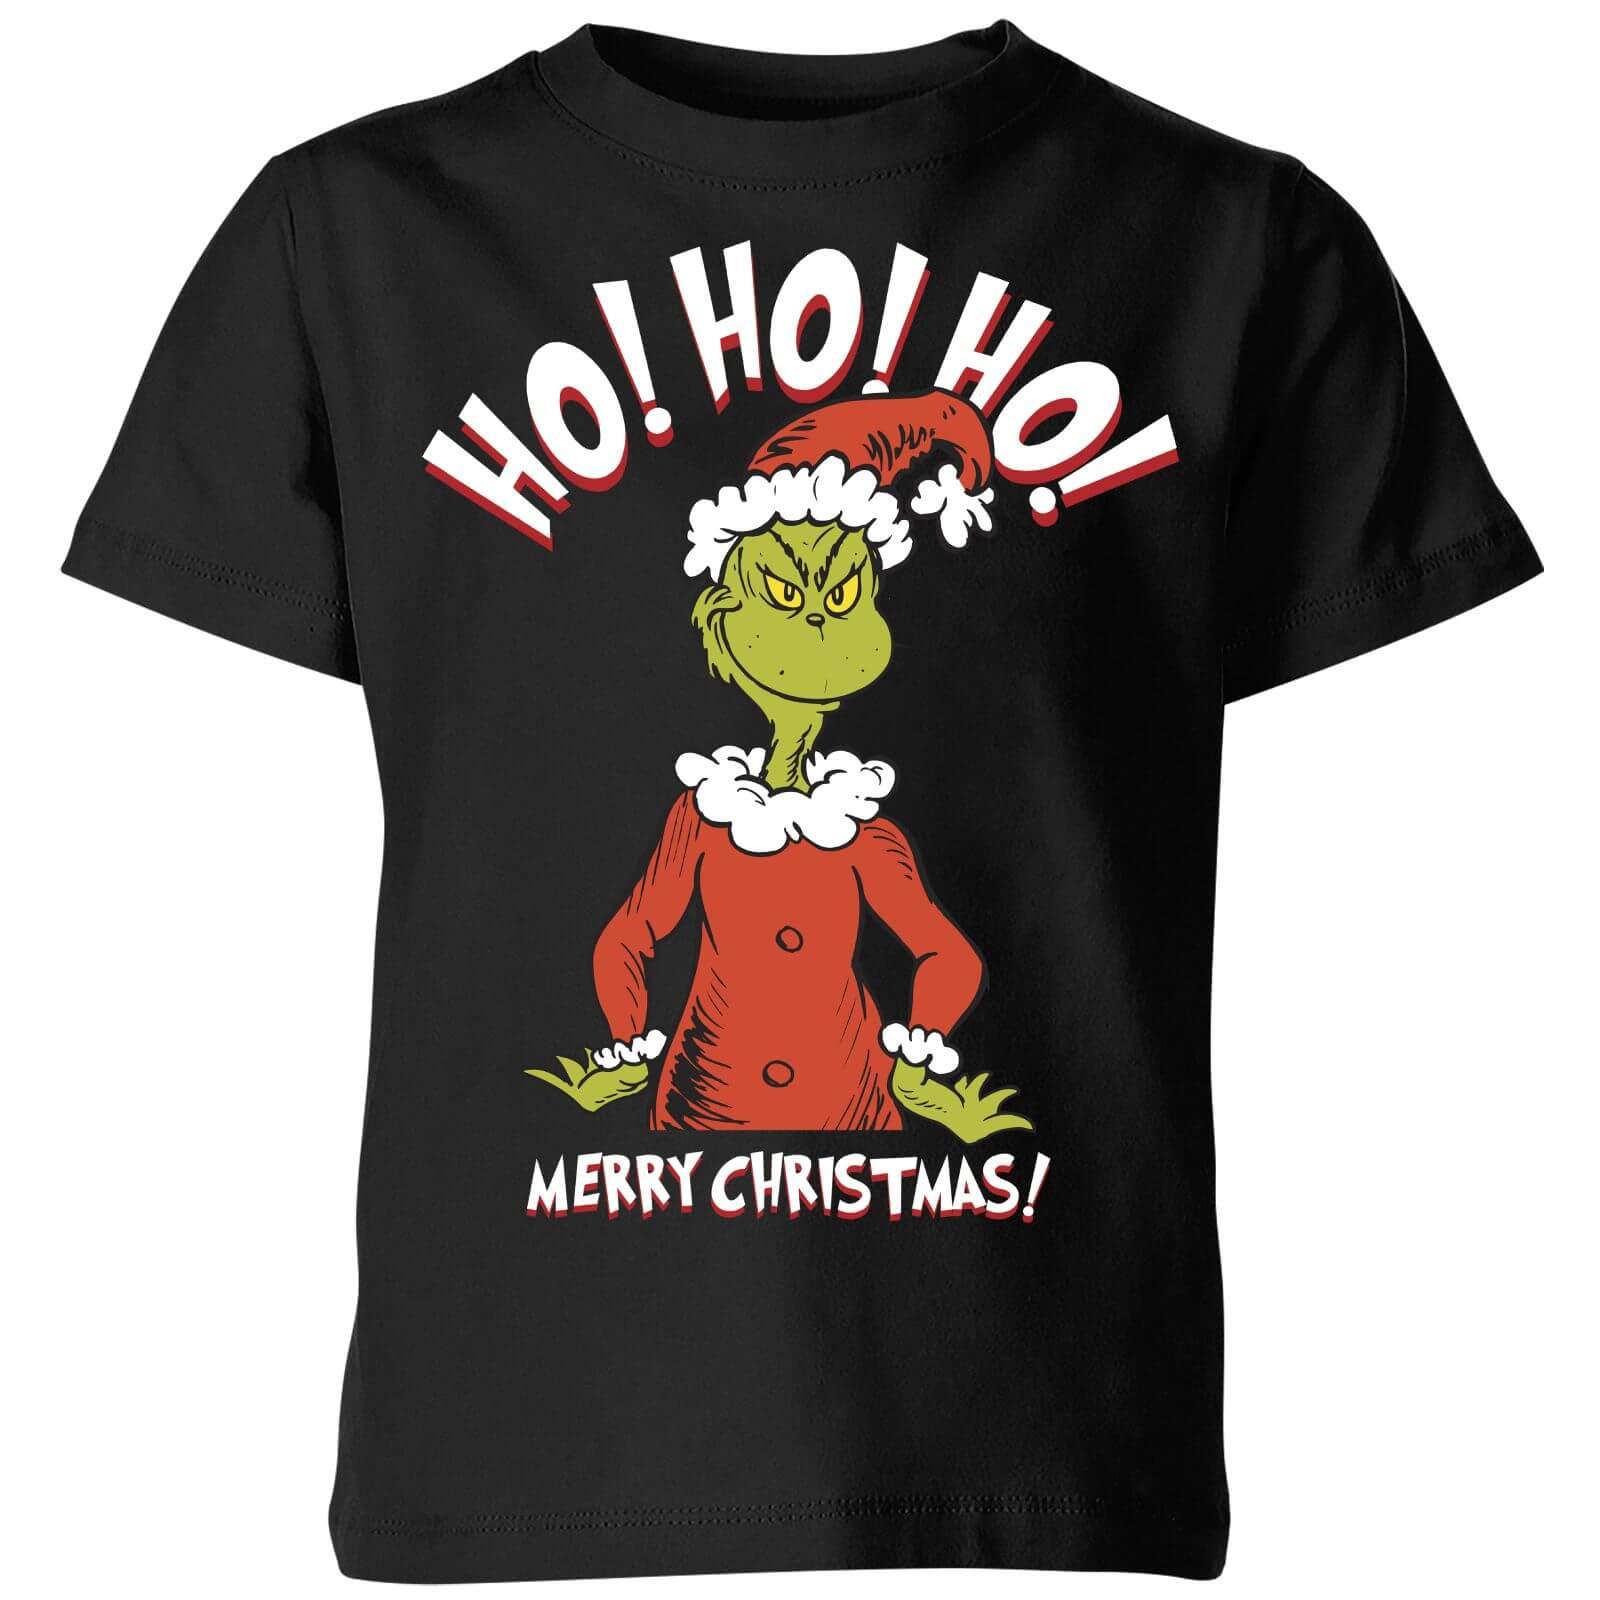 The Grinch Ho Ho Ho Smile Kids Christmas T-Shirt - Black   IWOOT